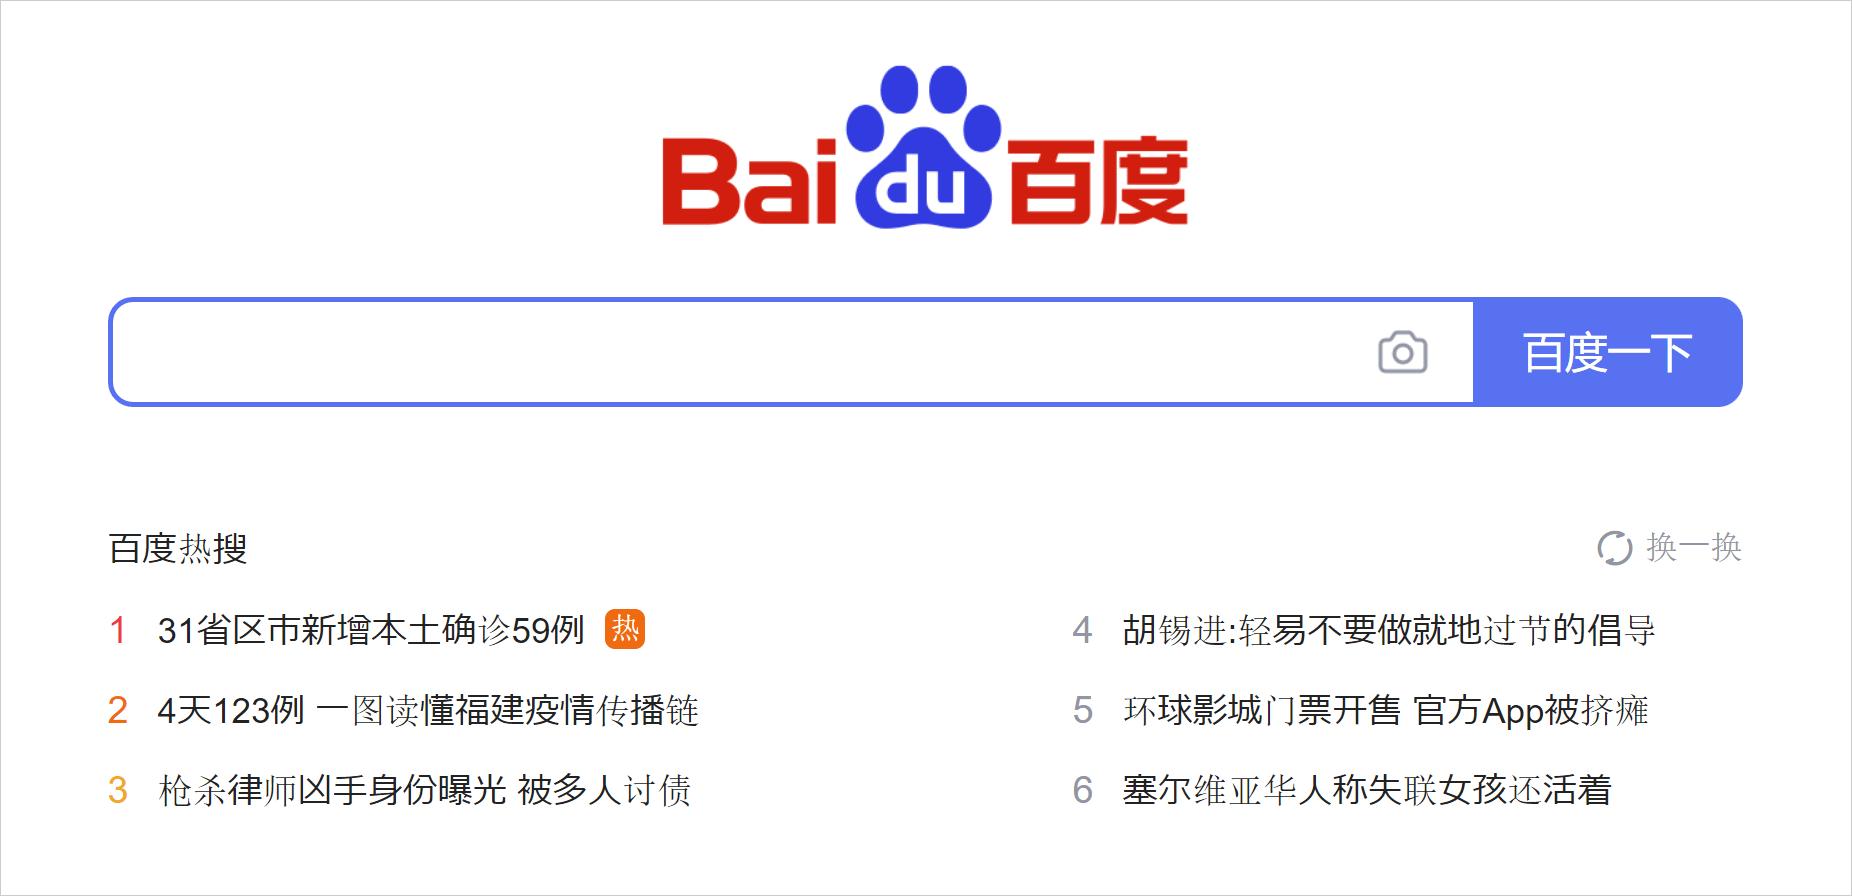 Baidu(百度[バイドゥ])